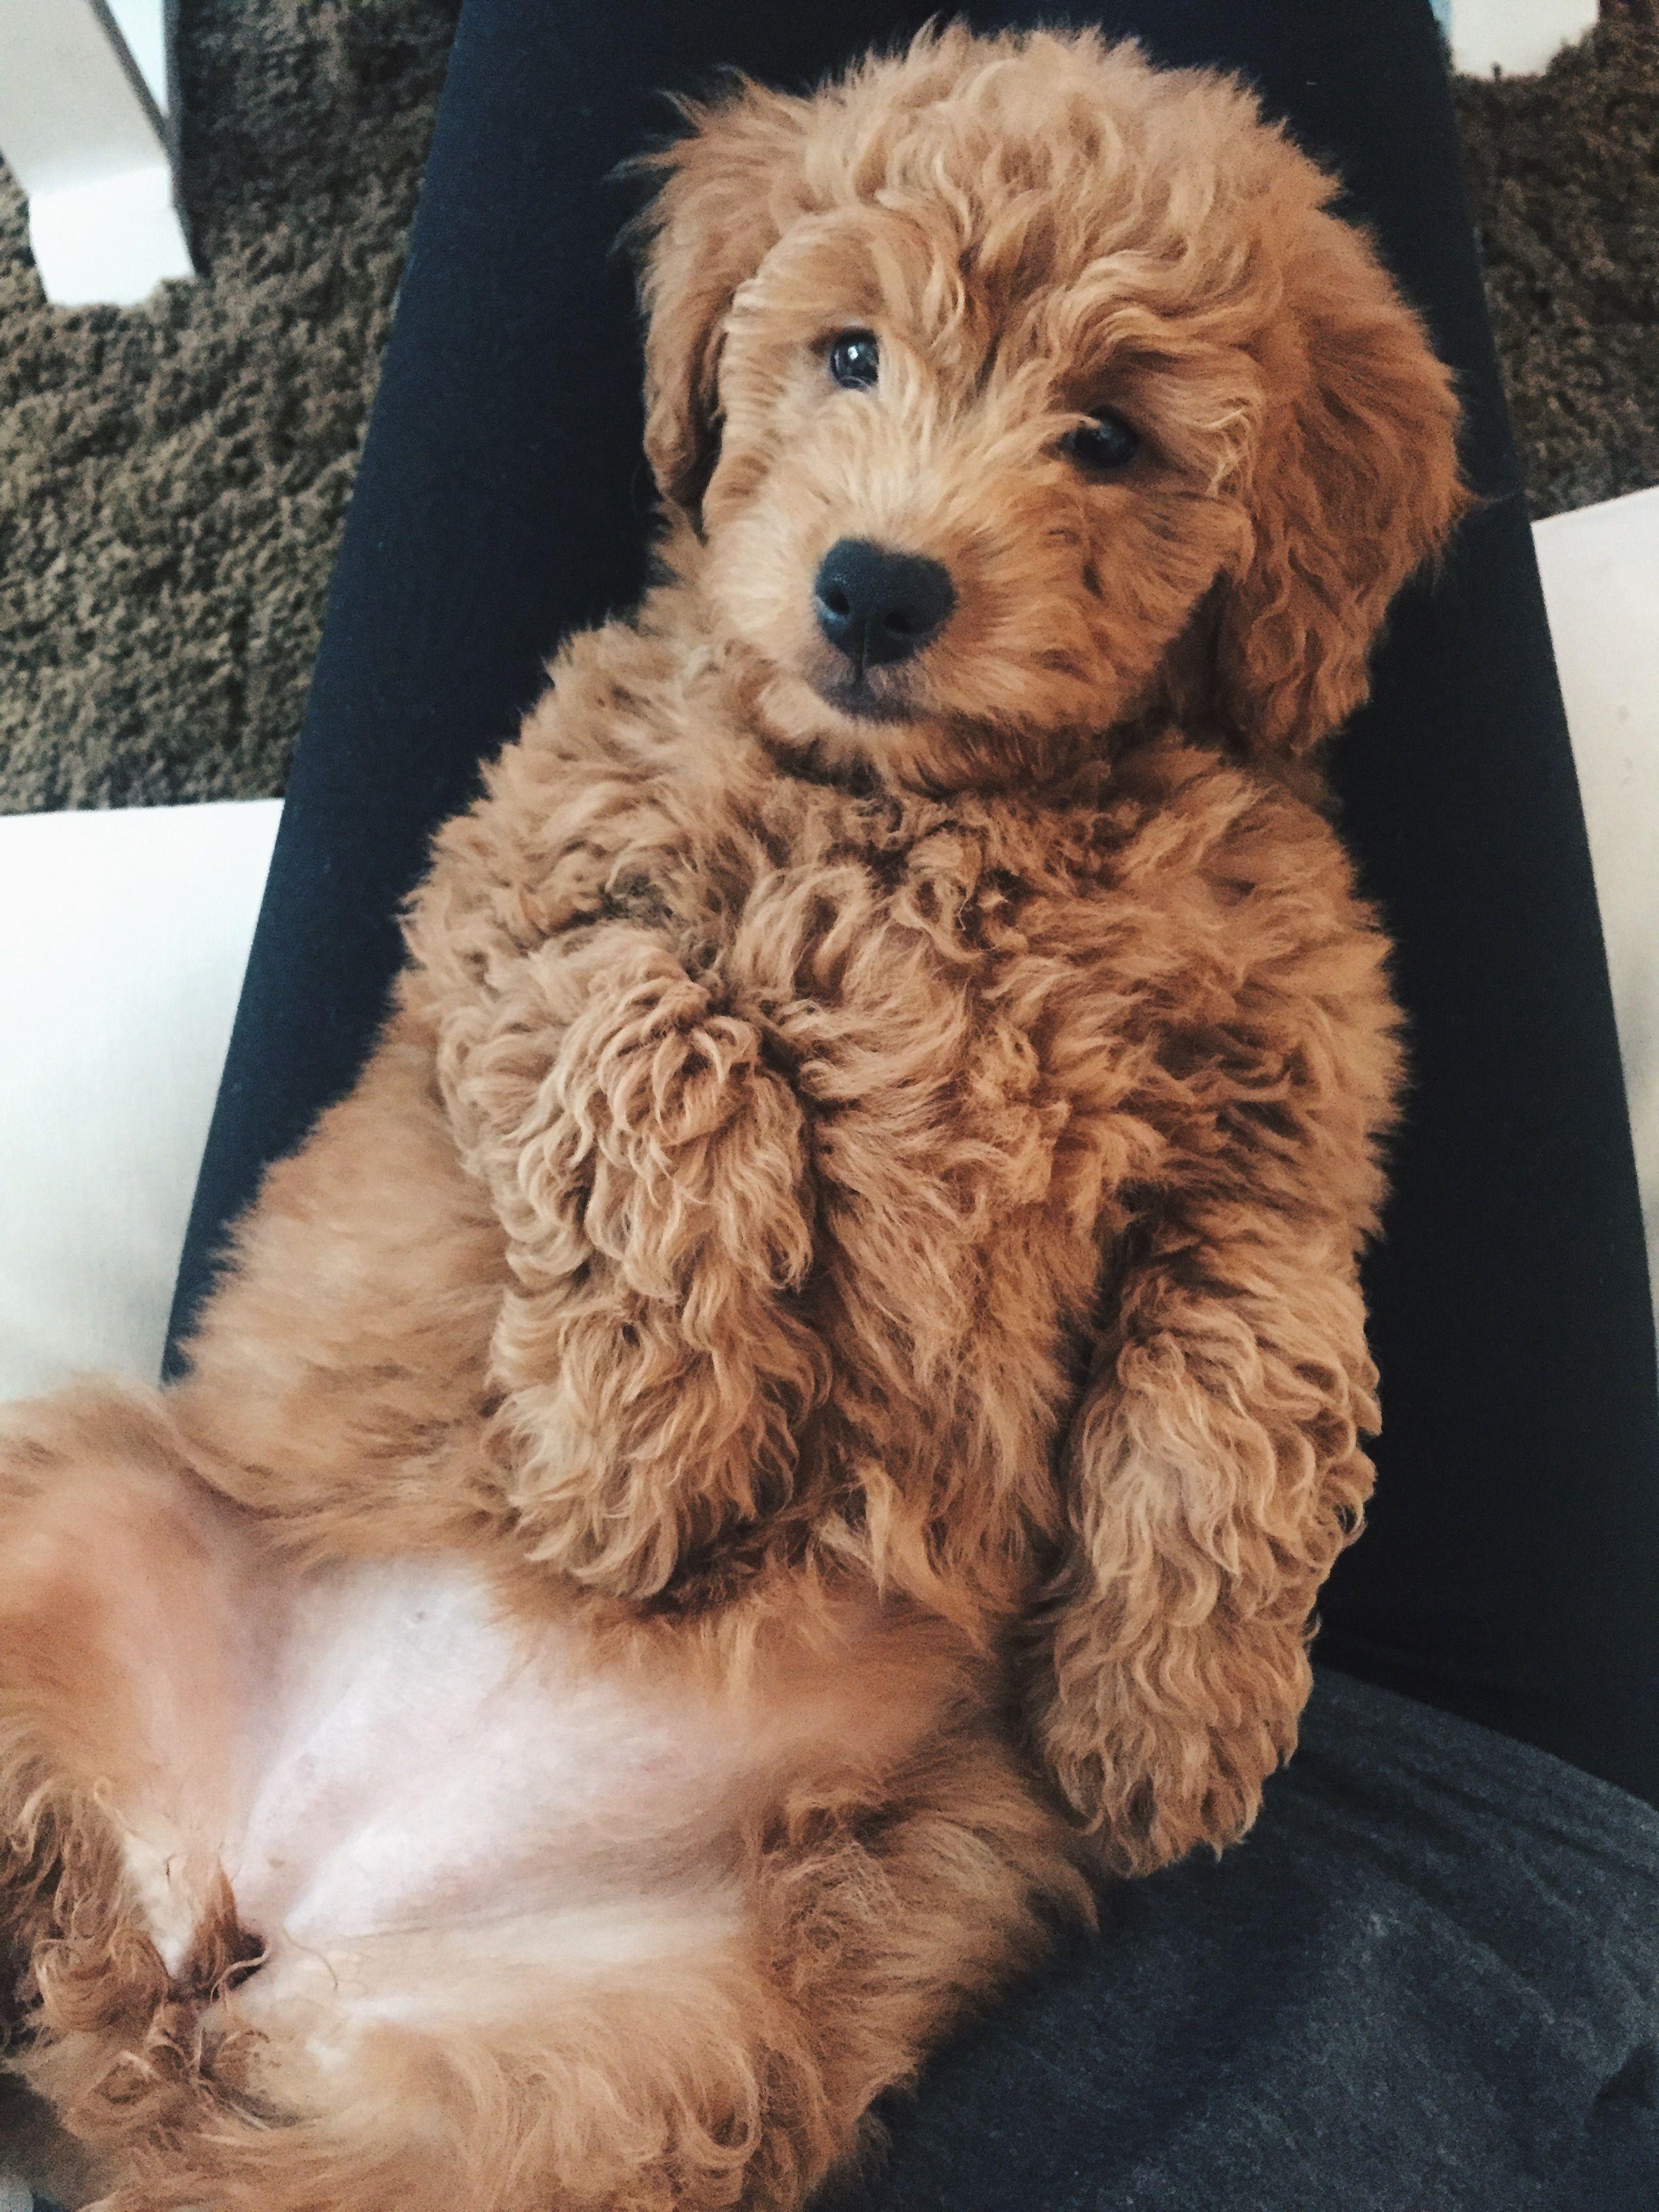 Ig Littlerosiedoodle In 2020 Cockapoo Dog Cute Baby Animals Puppies